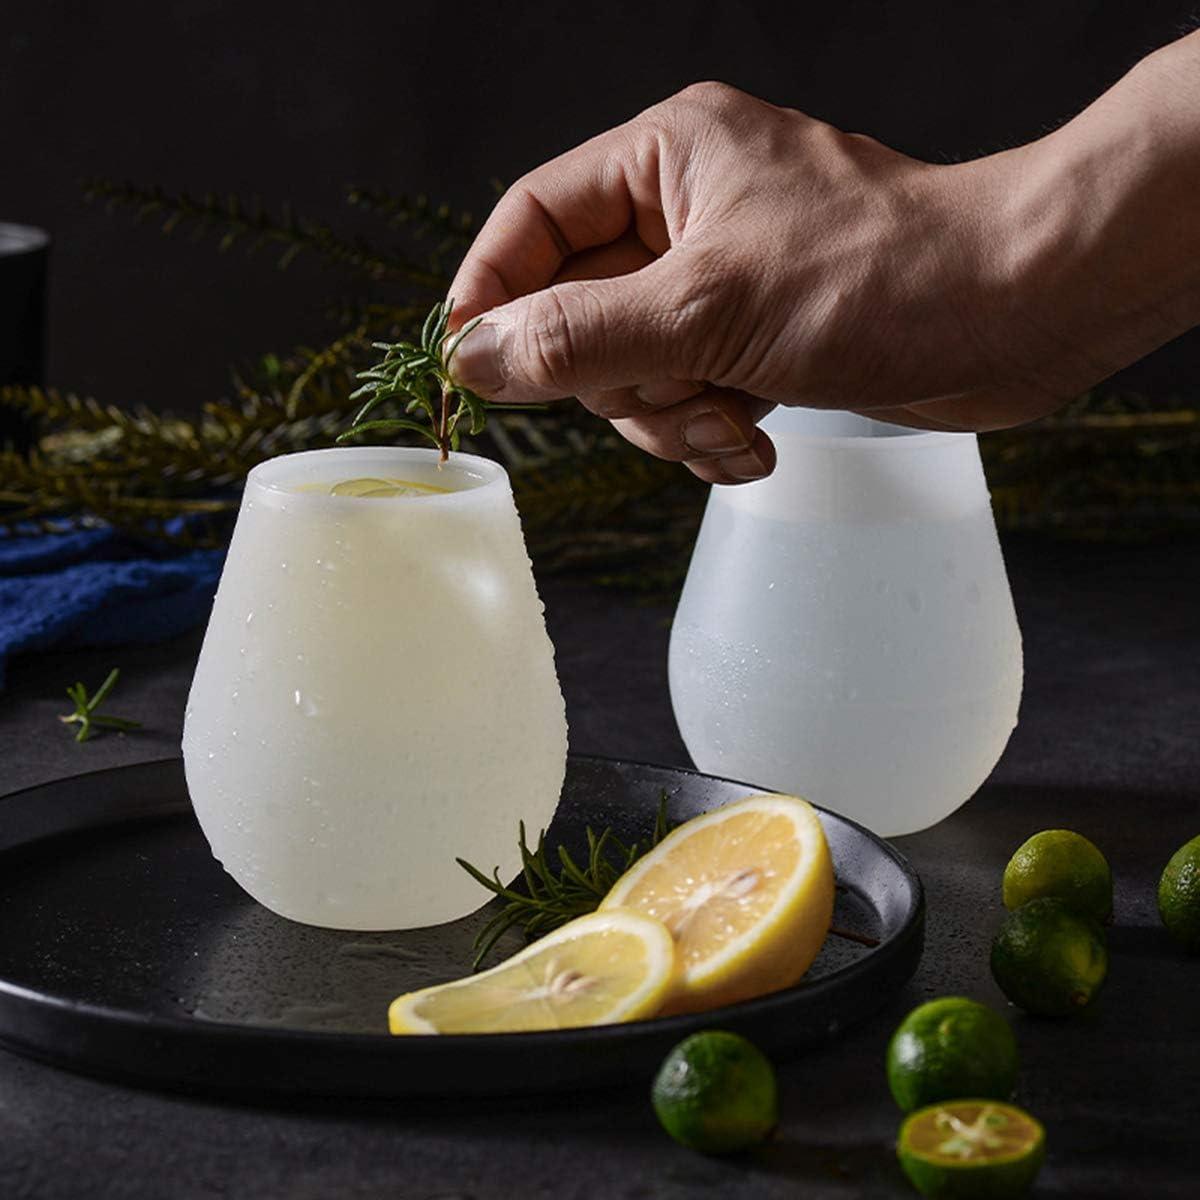 Dancepandas Vasos de Vino 5PCS Stemless Wine Glasses Copas de Vino Silicona Silicone Wine Glasses para Llevar de Picnic o de Camping Blanco